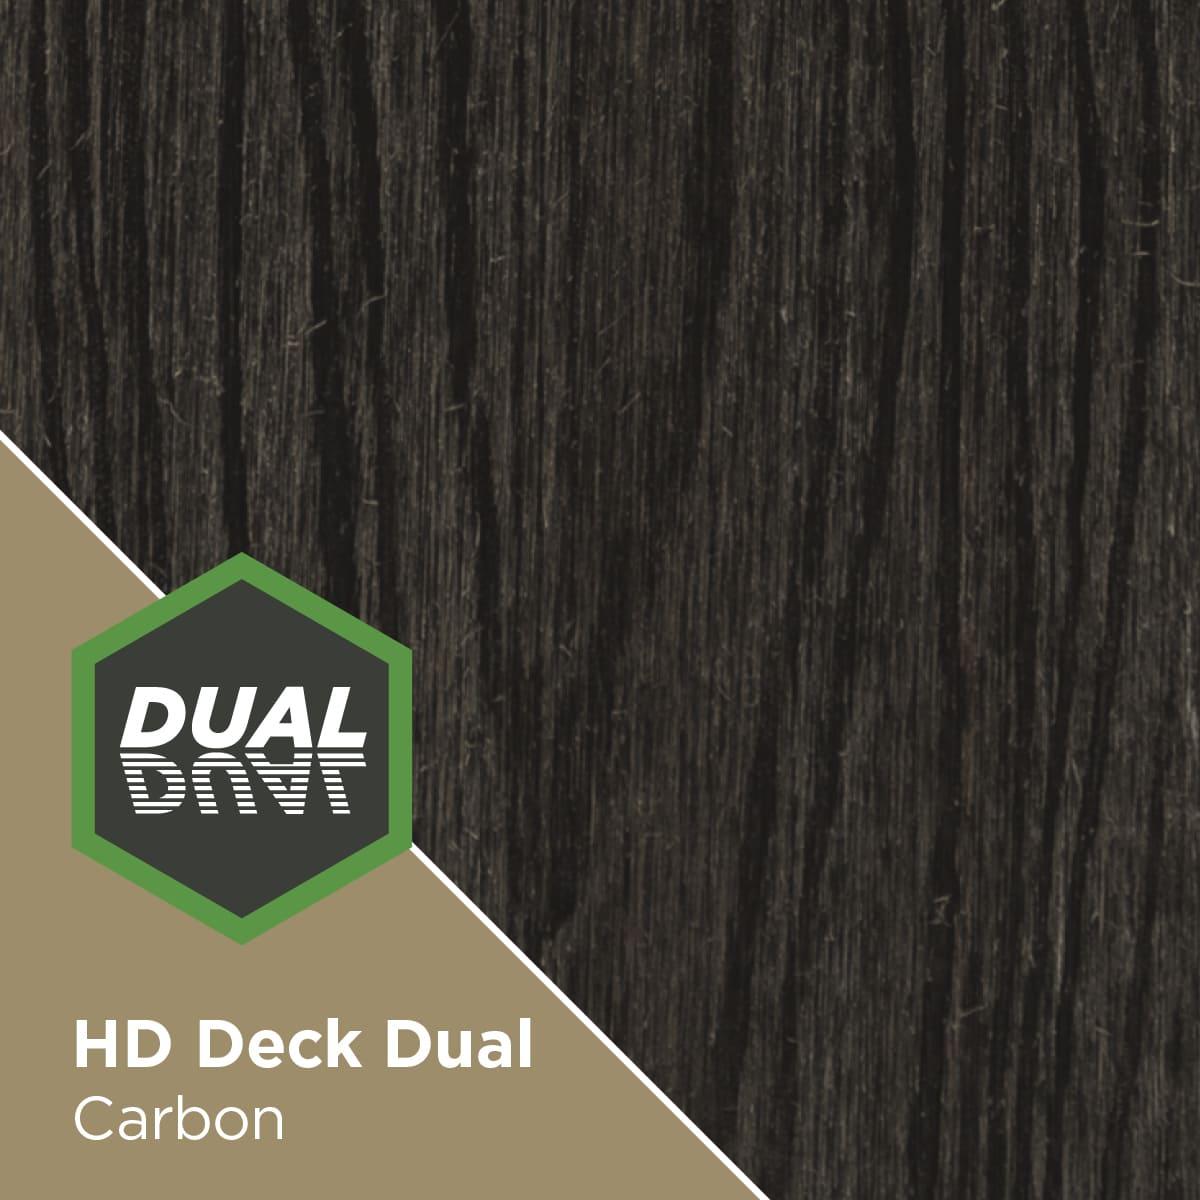 HD Deck Dual Carbon